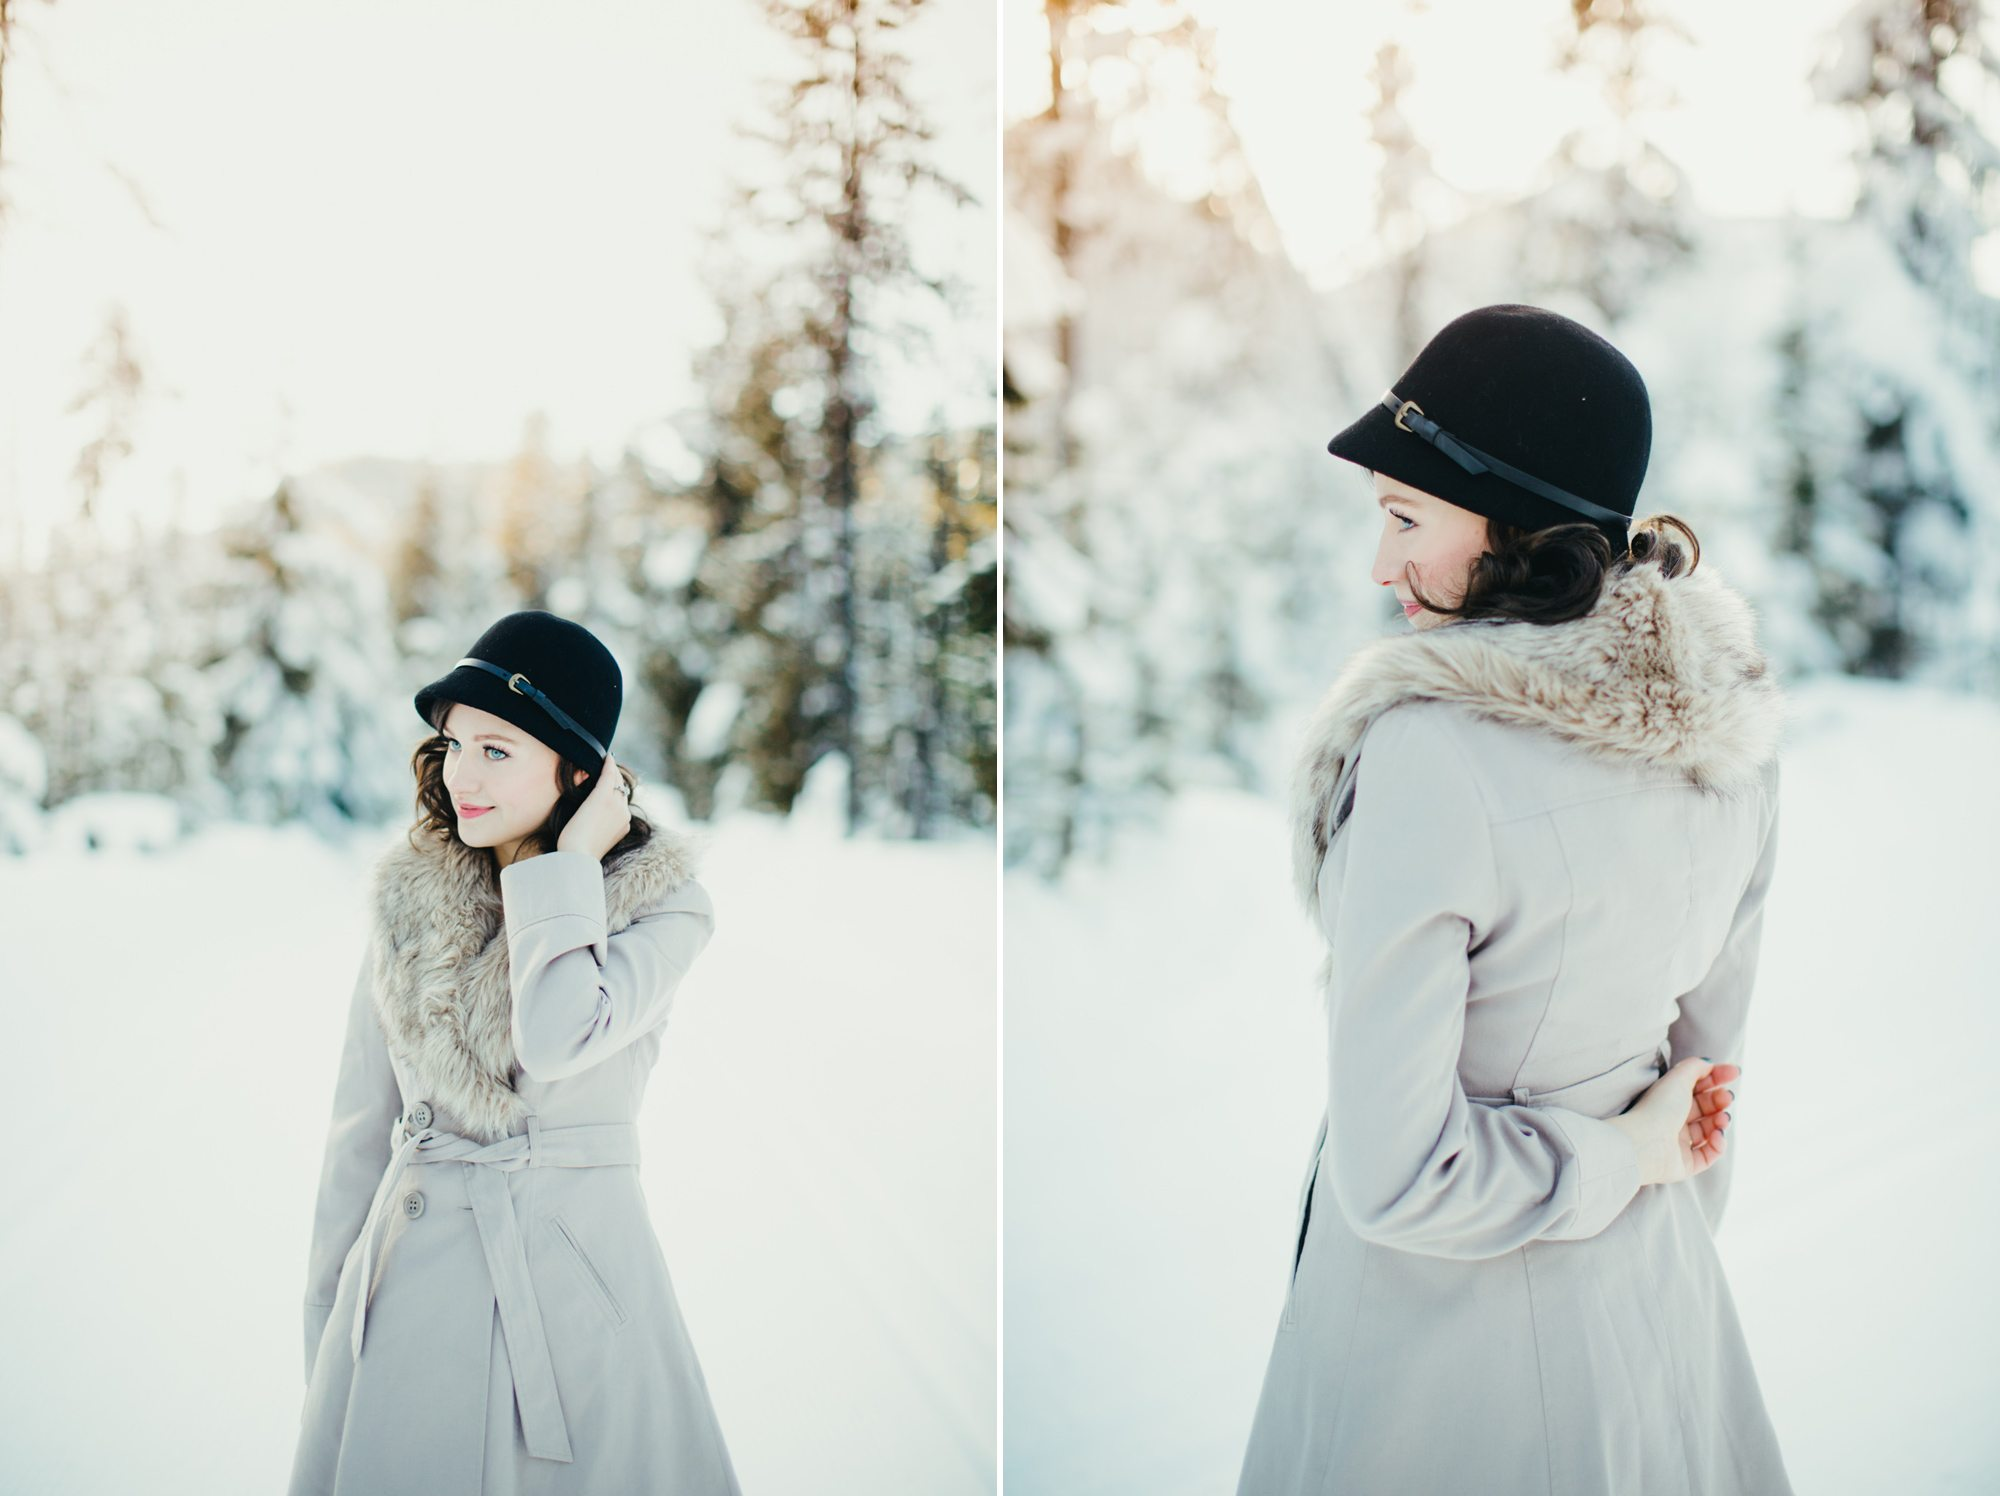 030-adventure-engagement-photographer